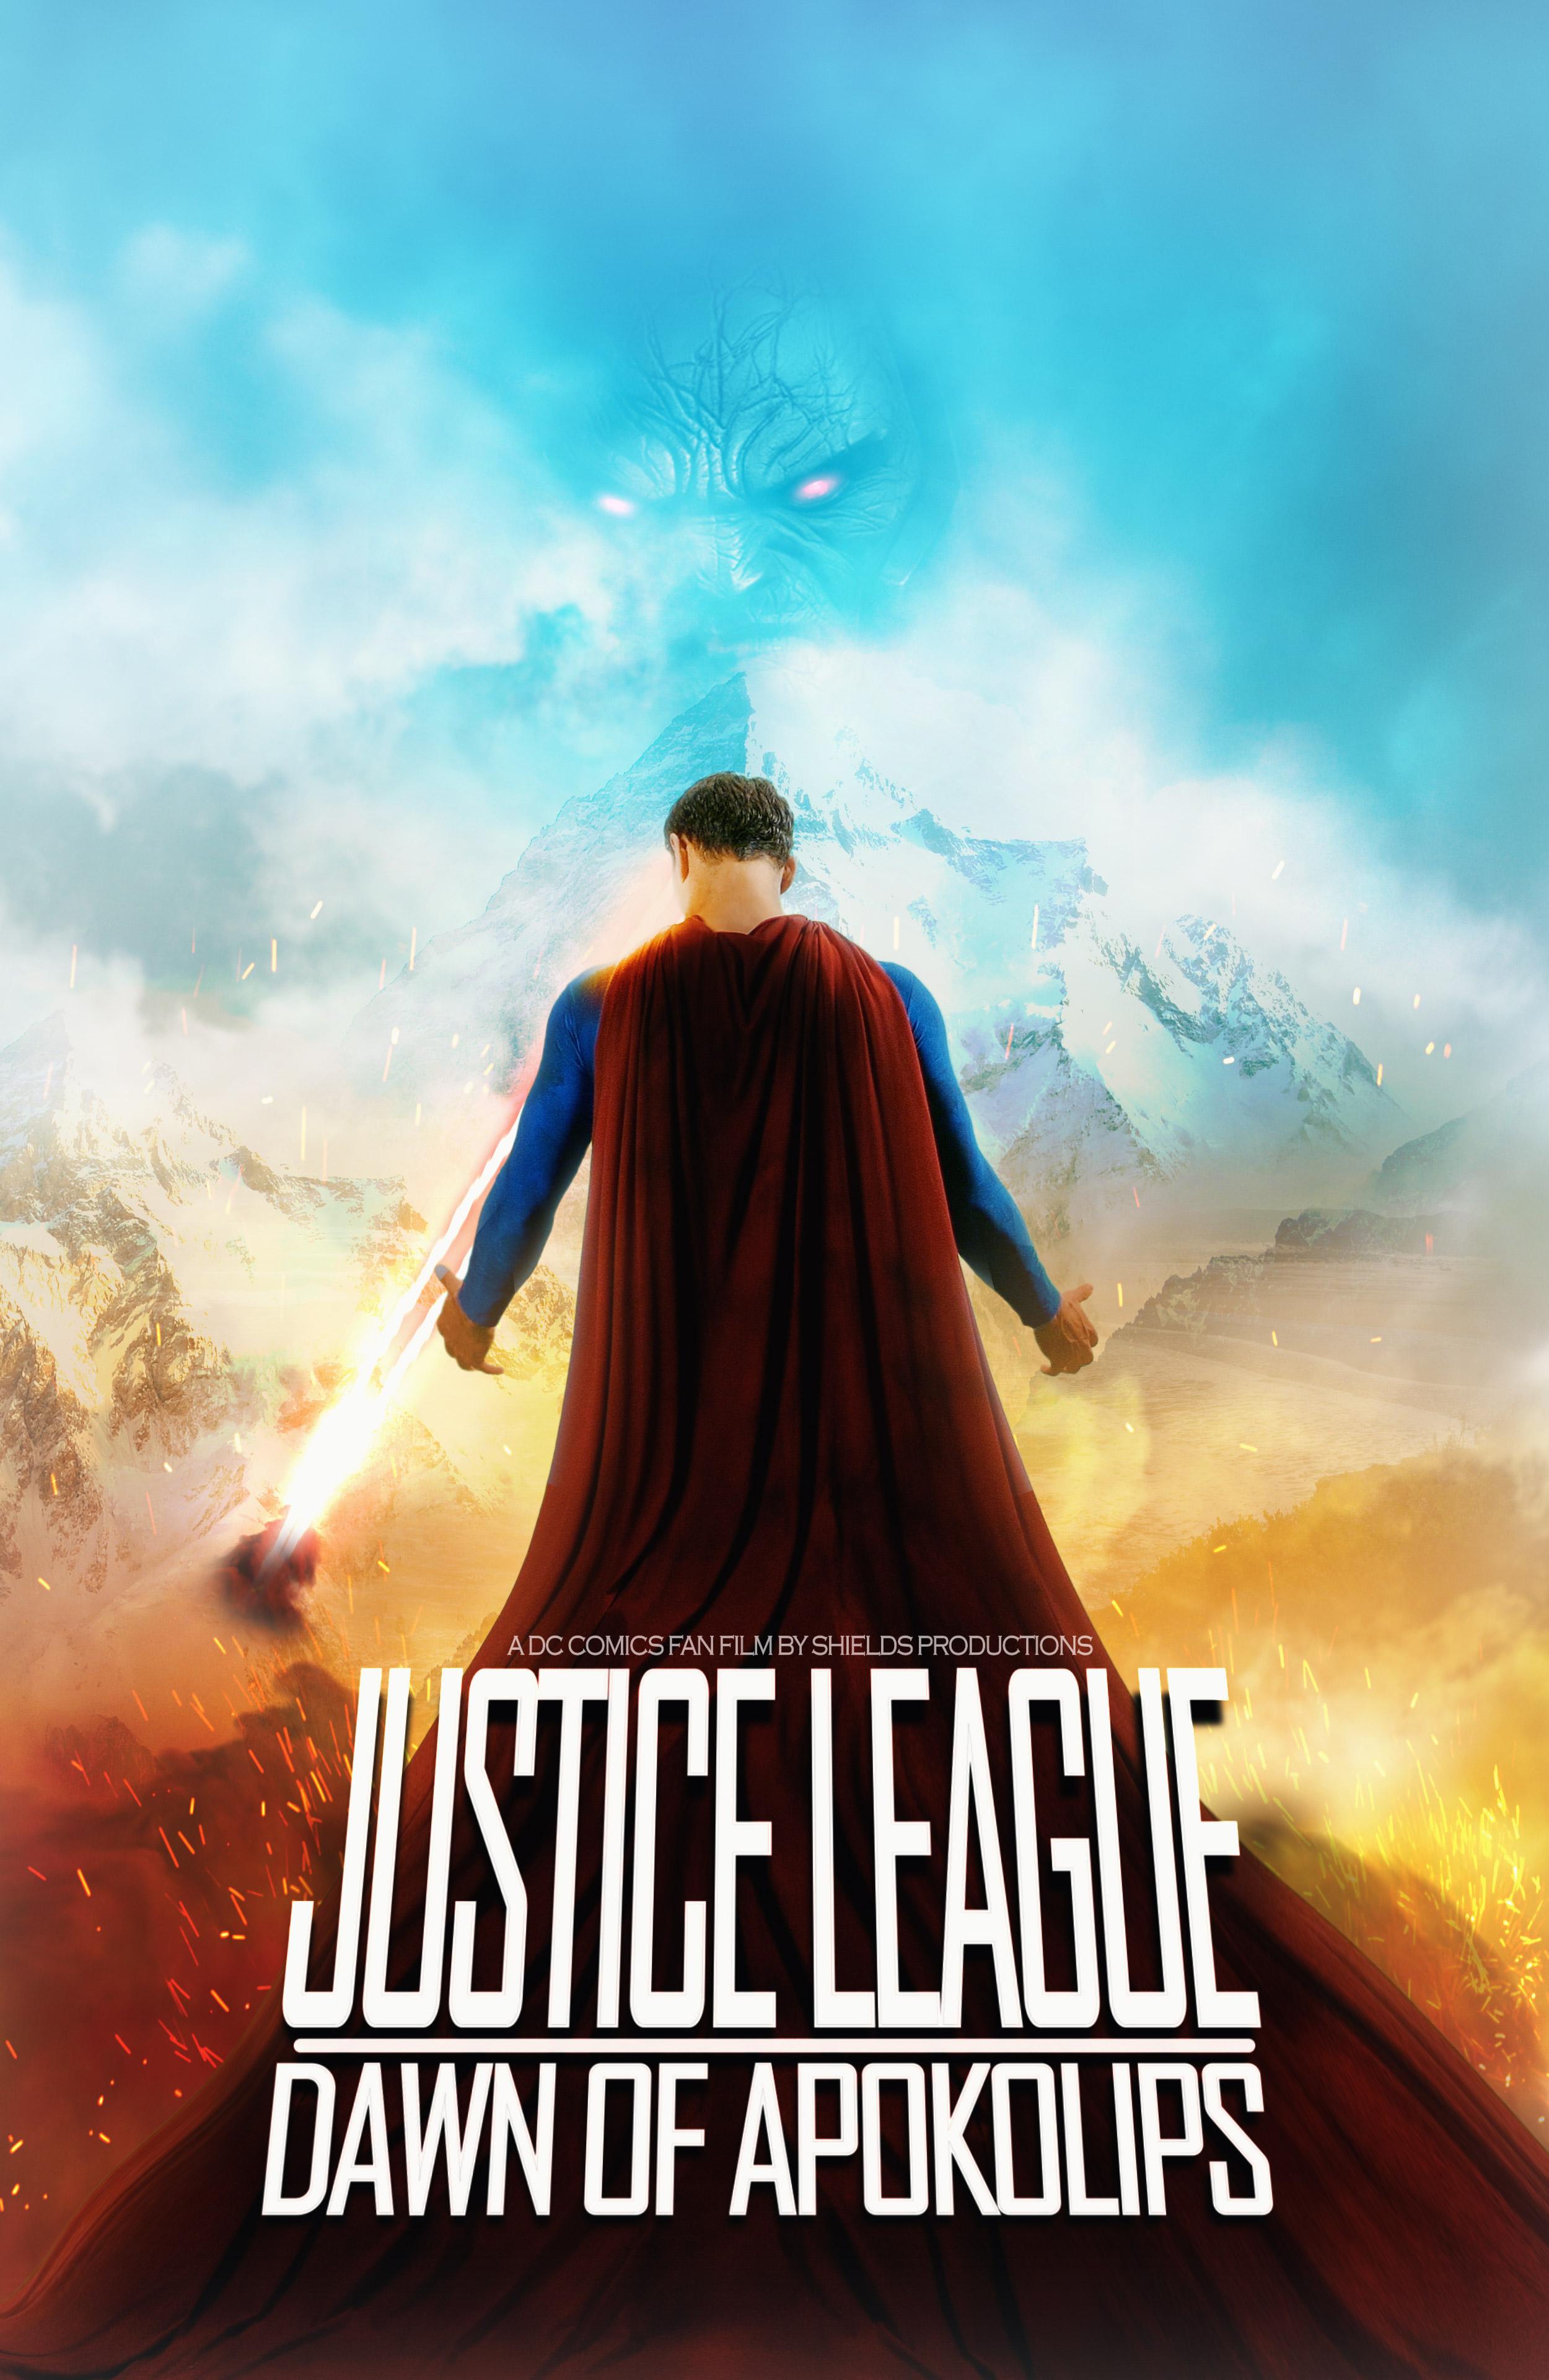 justice league dawn of apokolips 2017